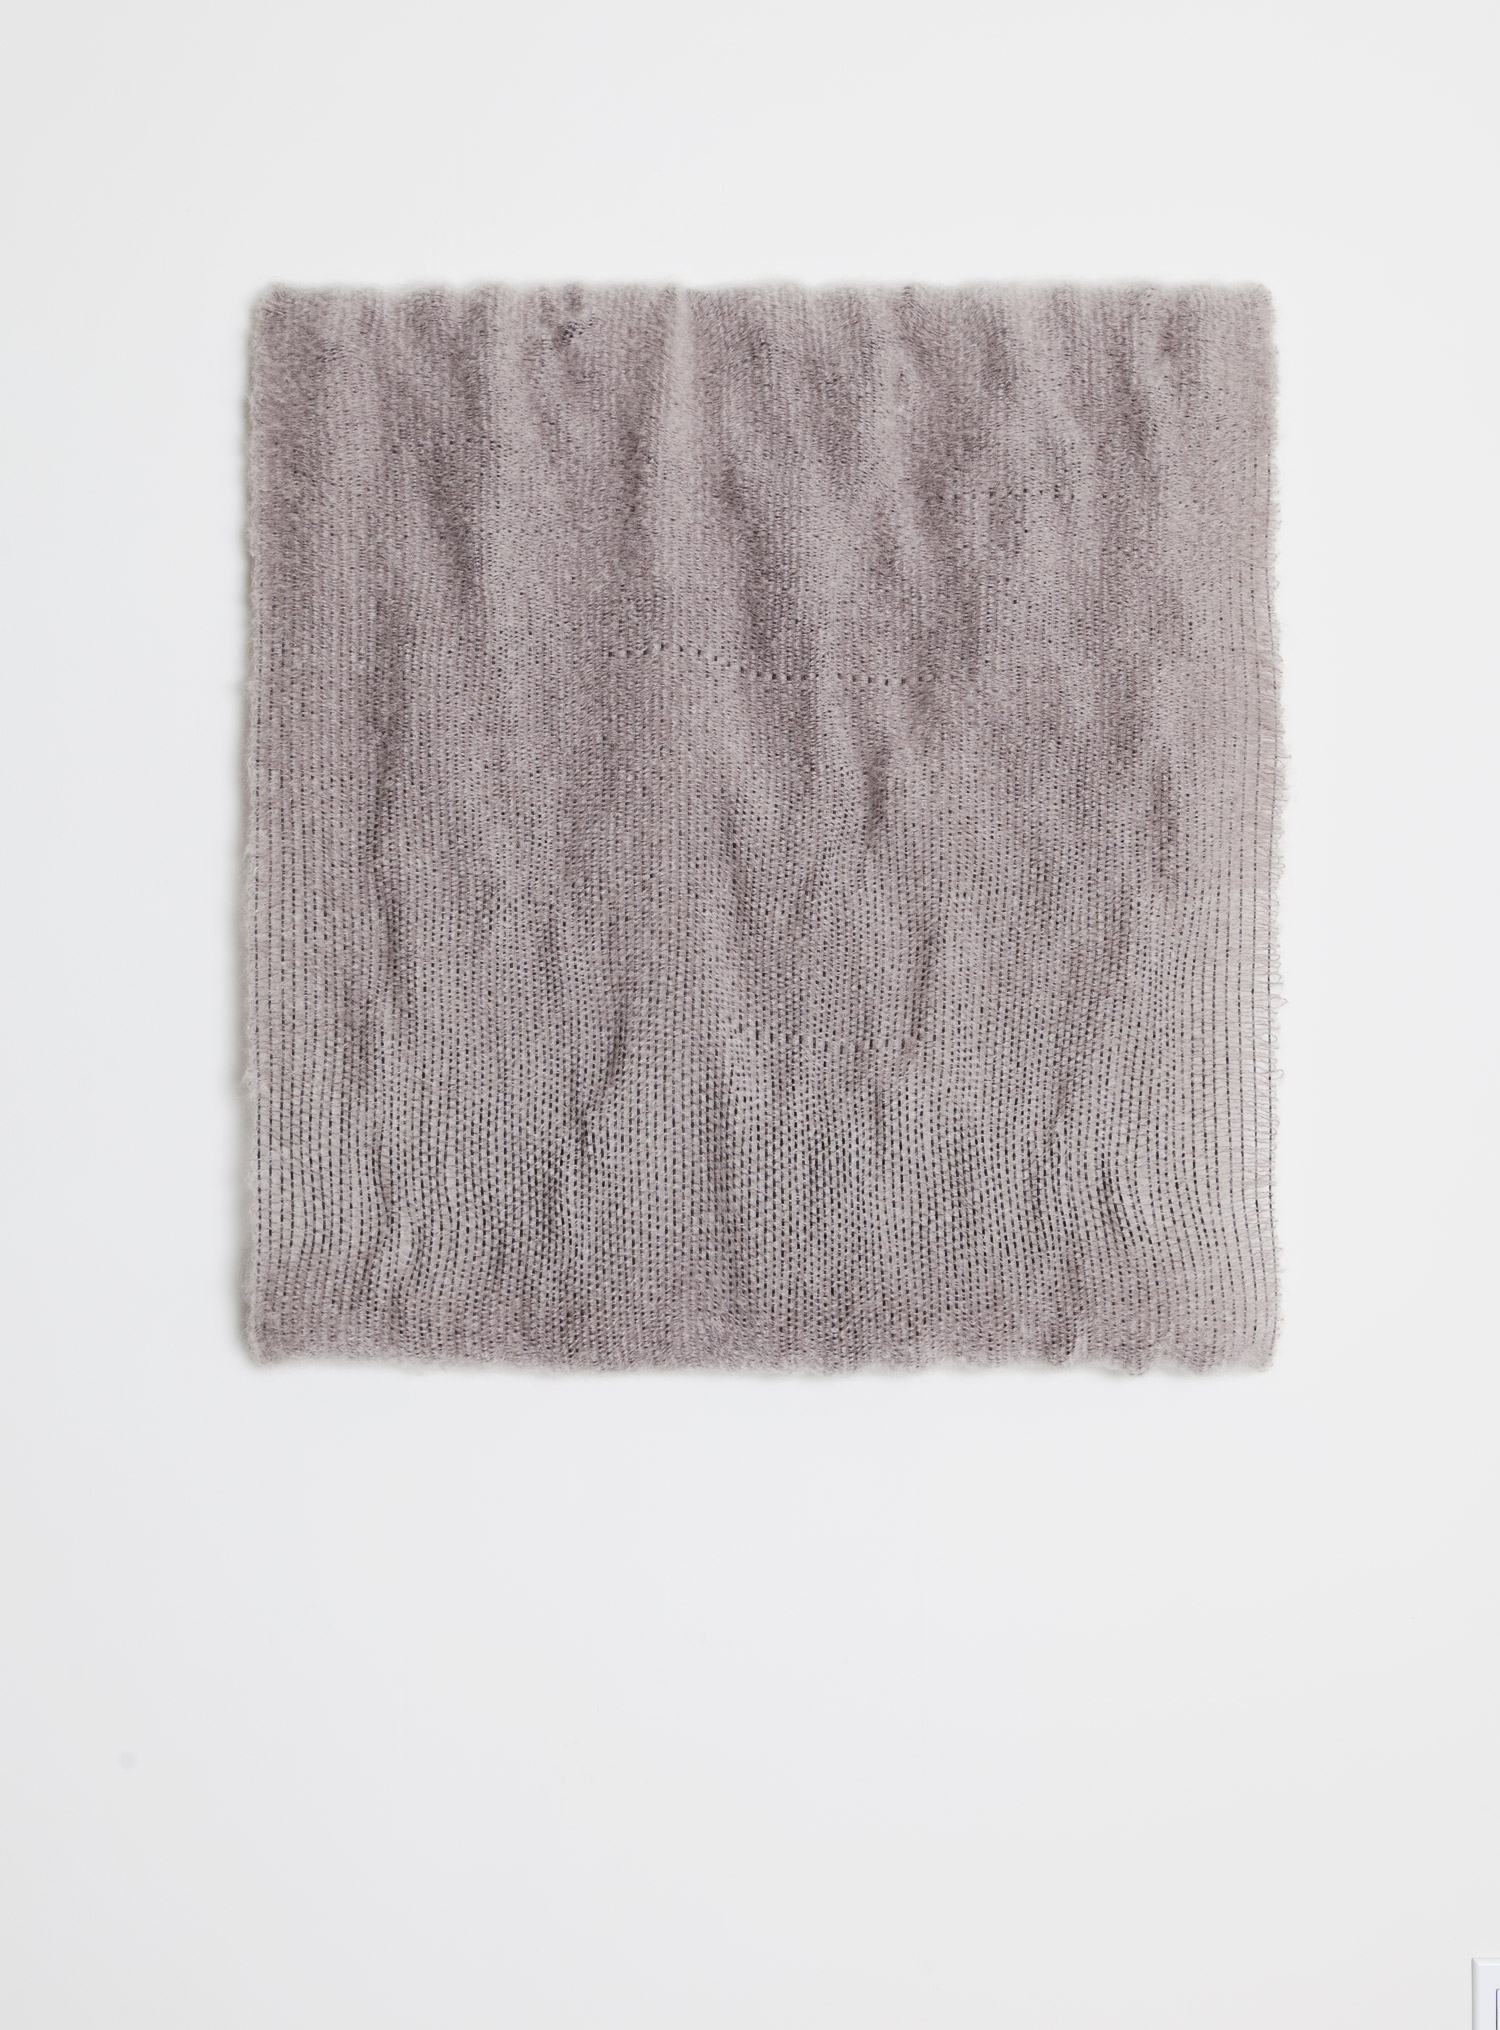 mimijung_weaving_muted_ripples1.jpg